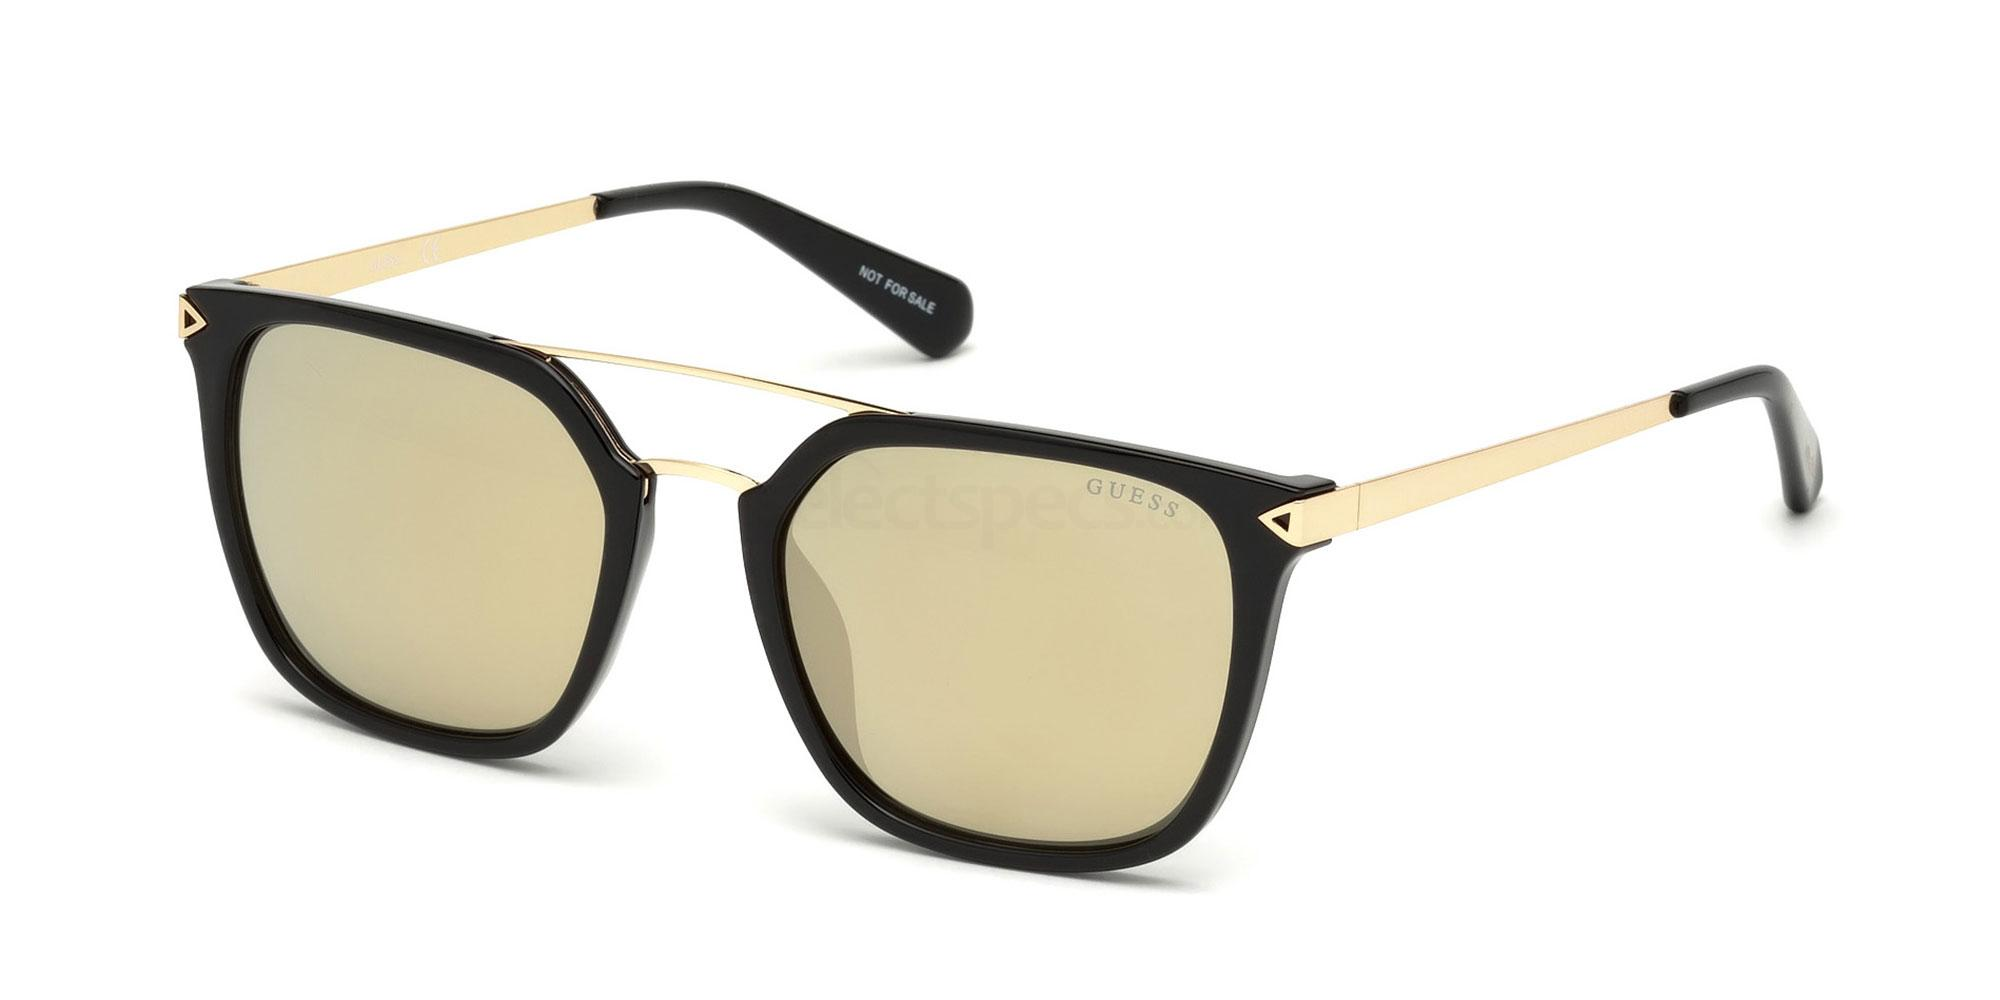 01G GU6922 Sunglasses, Guess